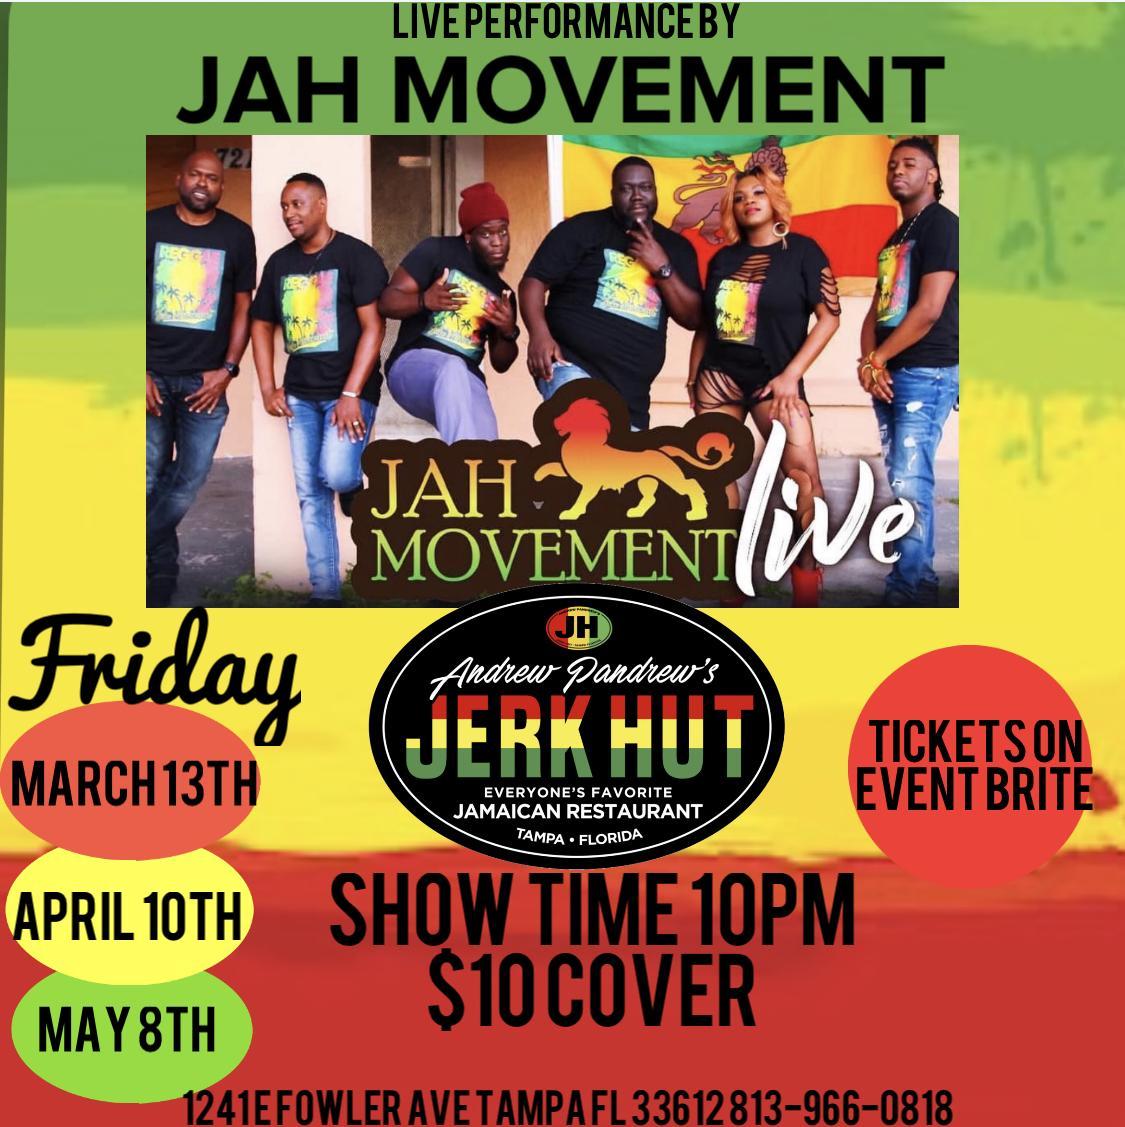 Jah Movement